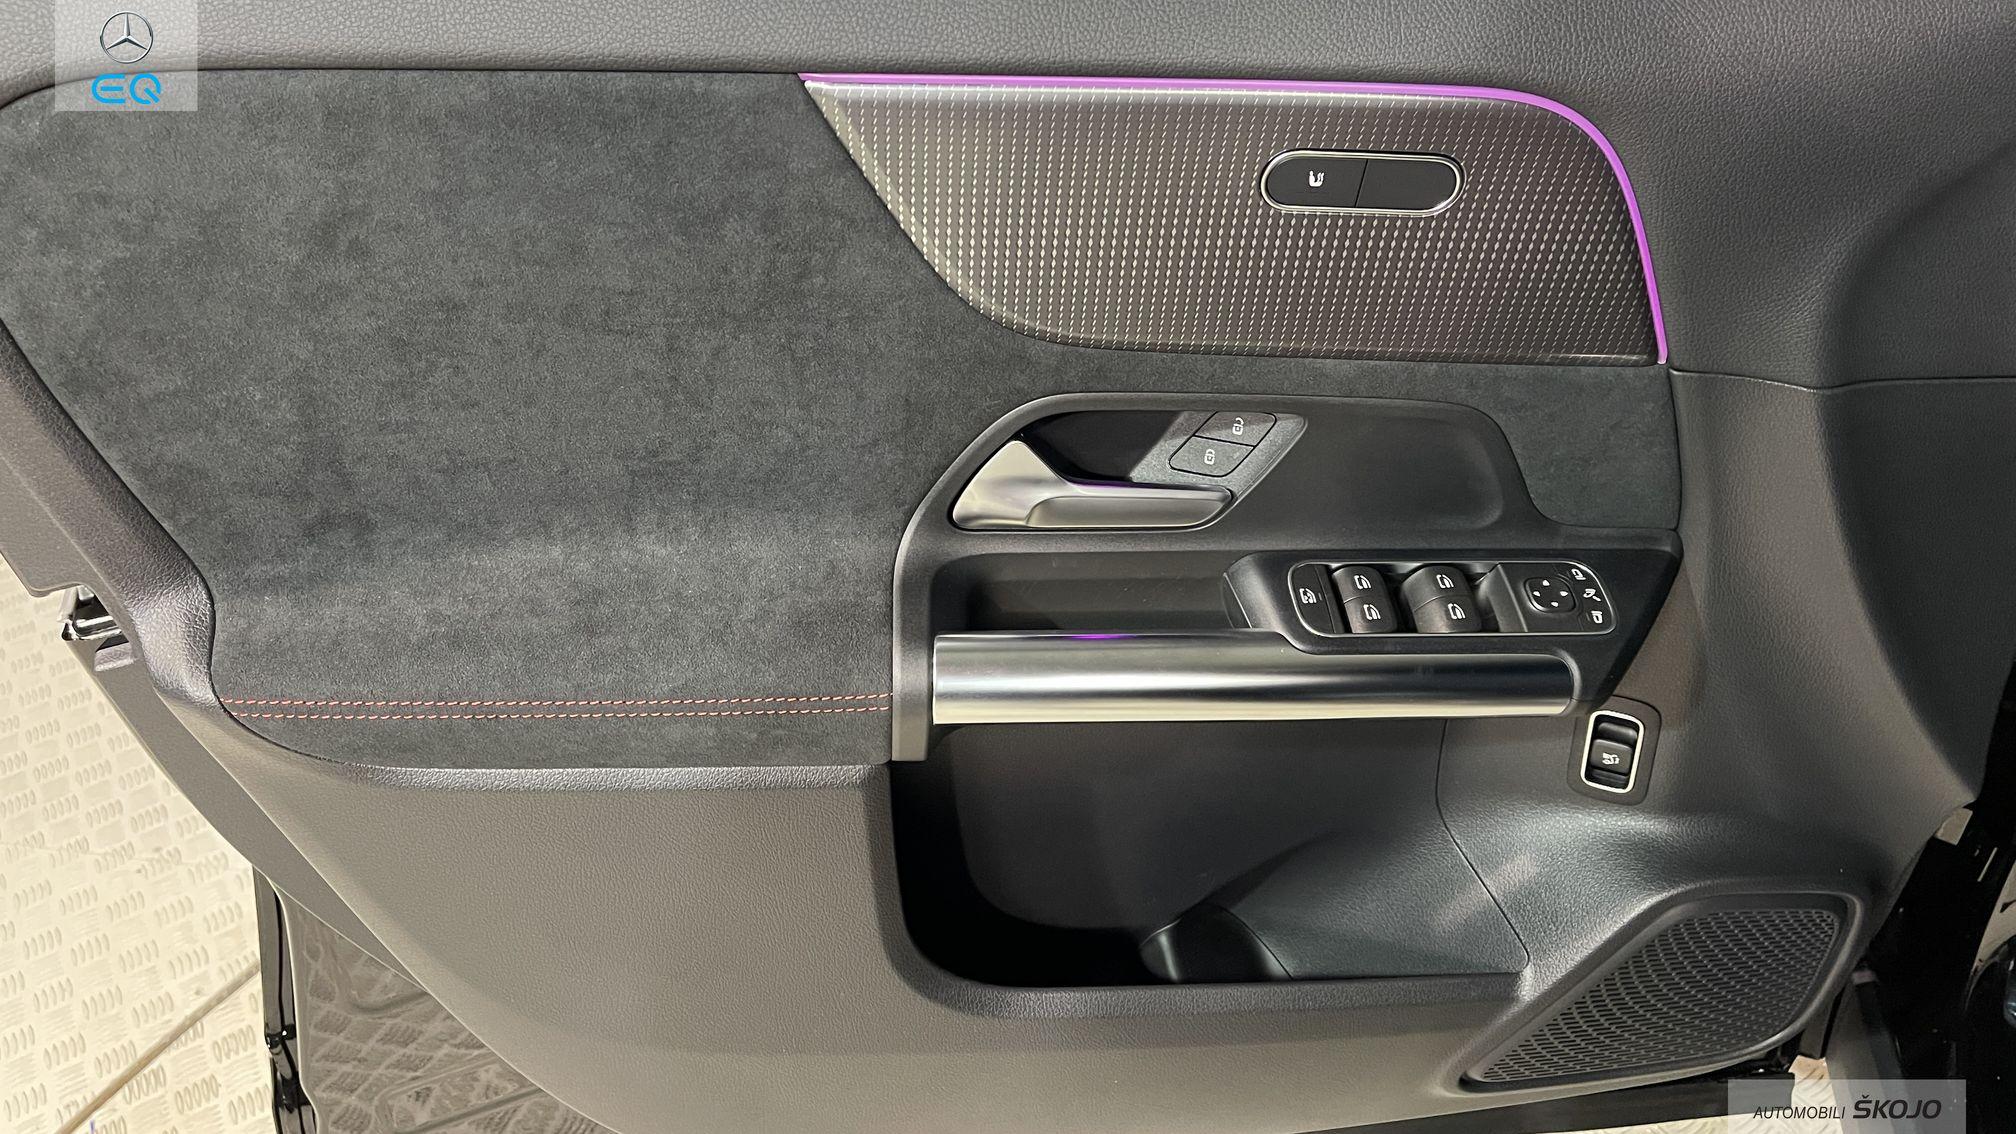 Mercedes-Benz_Škojo_10